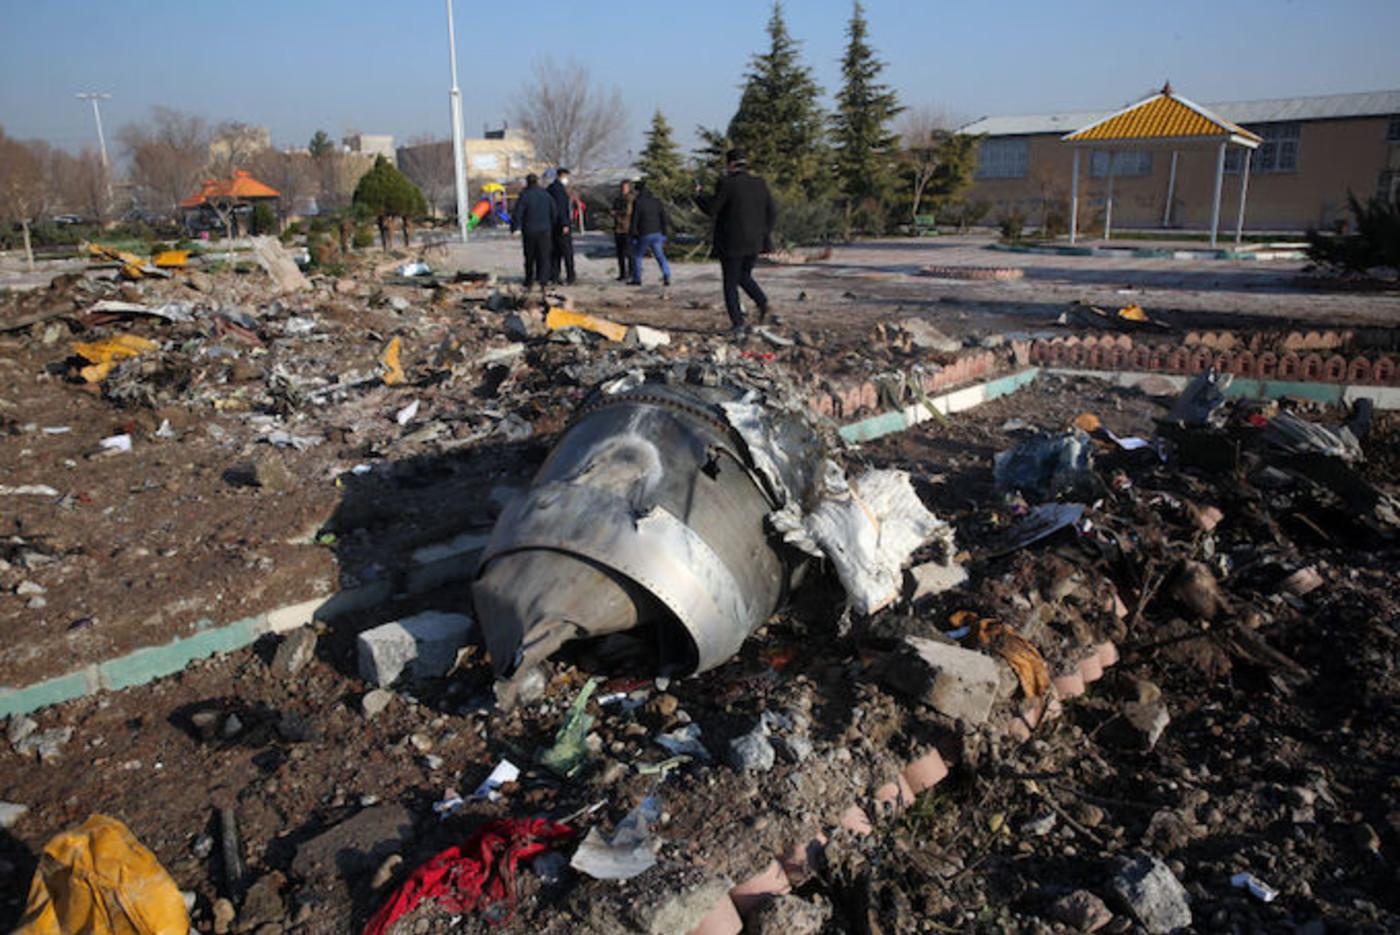 Rescue teams work amidst debris after a Ukrainian plane carrying 176 passengers crashed